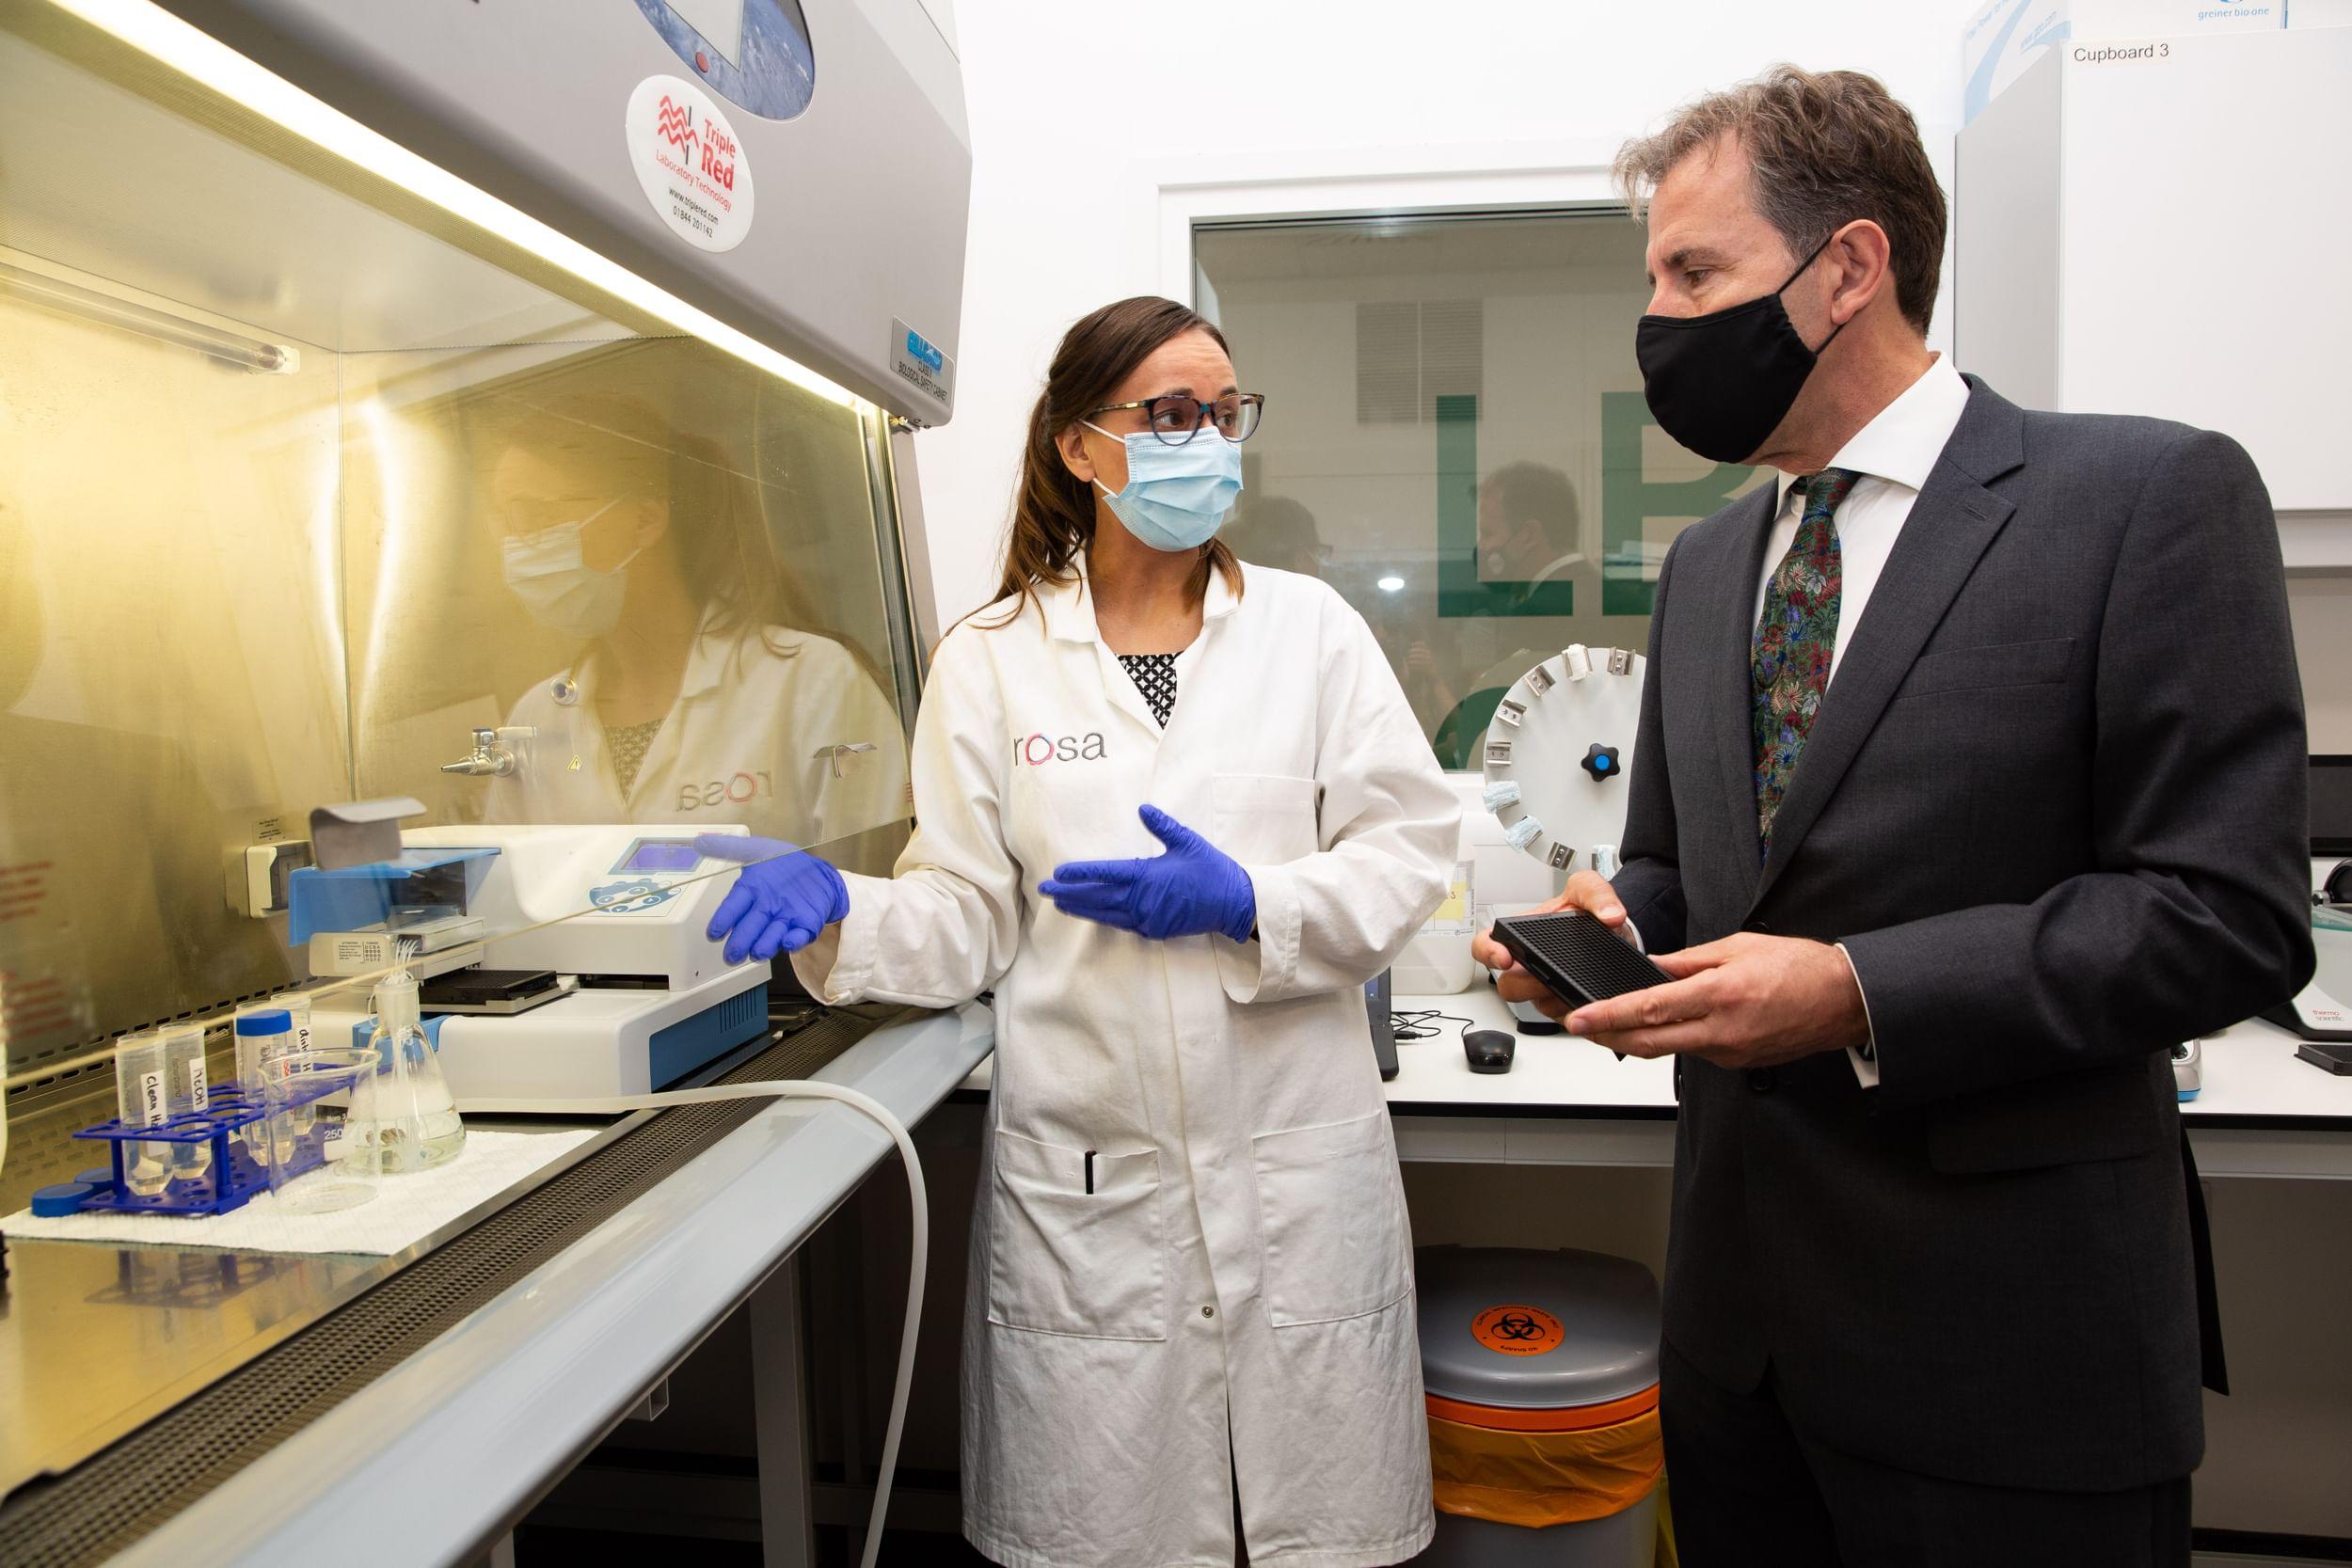 Metro Mayor Dan Norris meets the team behind Rosa Biotech based at Unit DX in Bristol